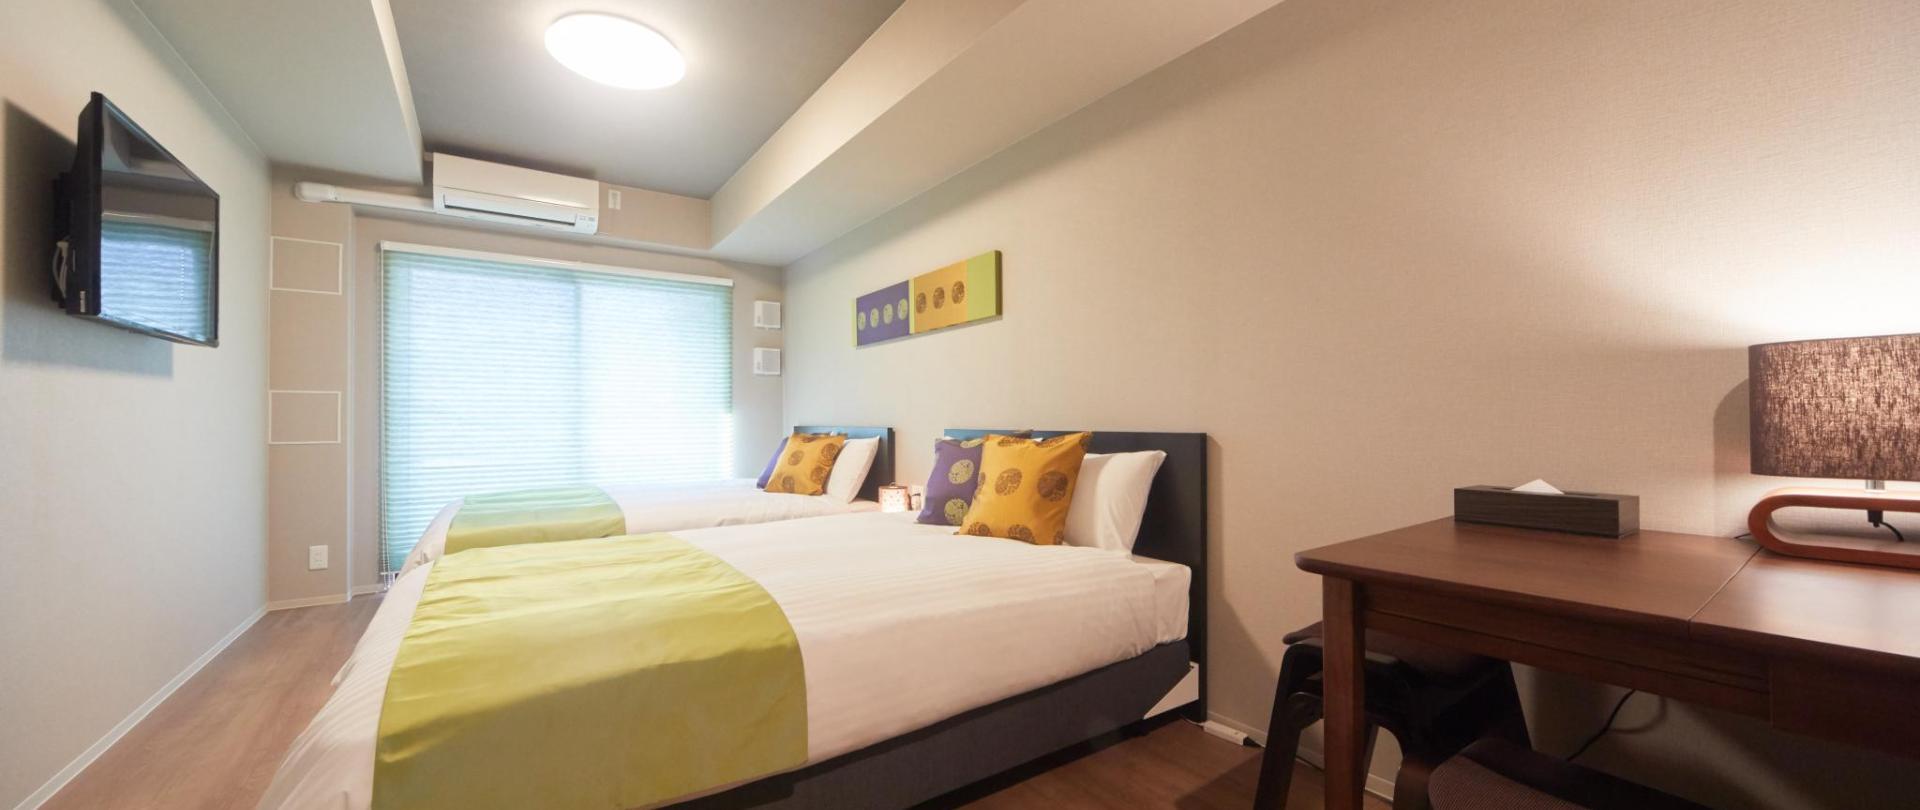 181217_HotelMondonce_193.jpg